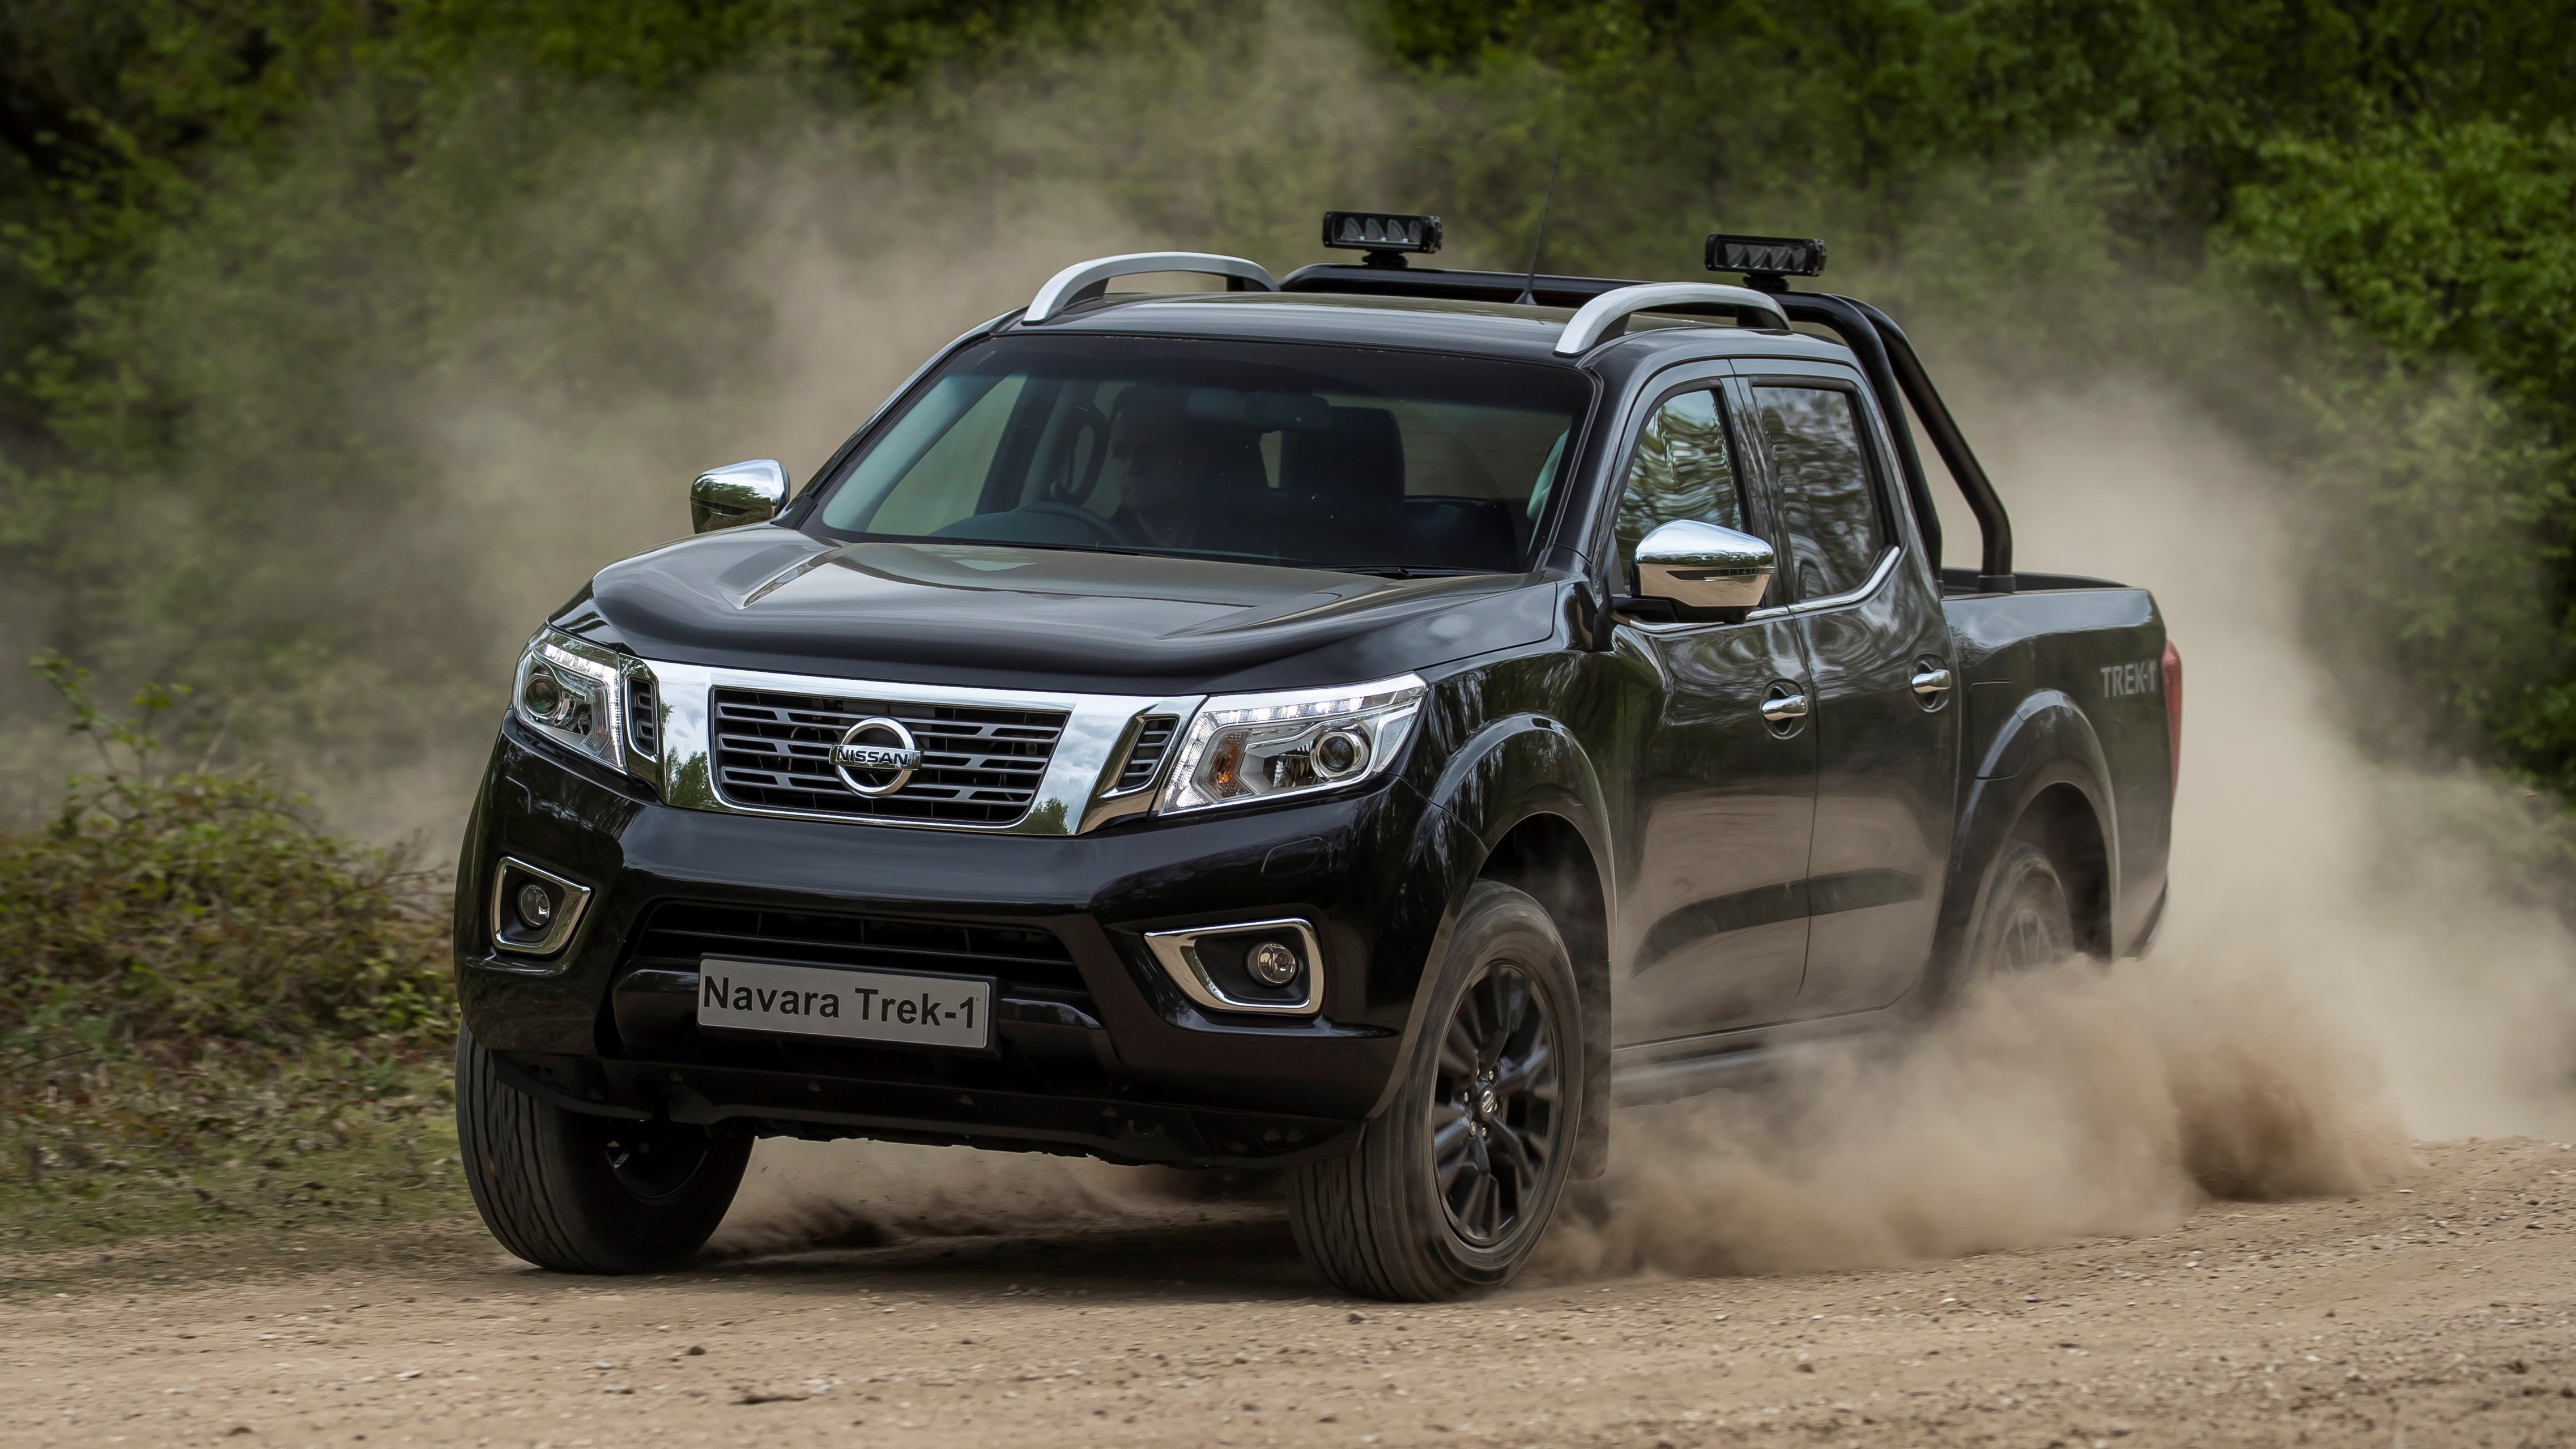 Nissan Navara Trek 1 Review Top Spec Pick Up Tested